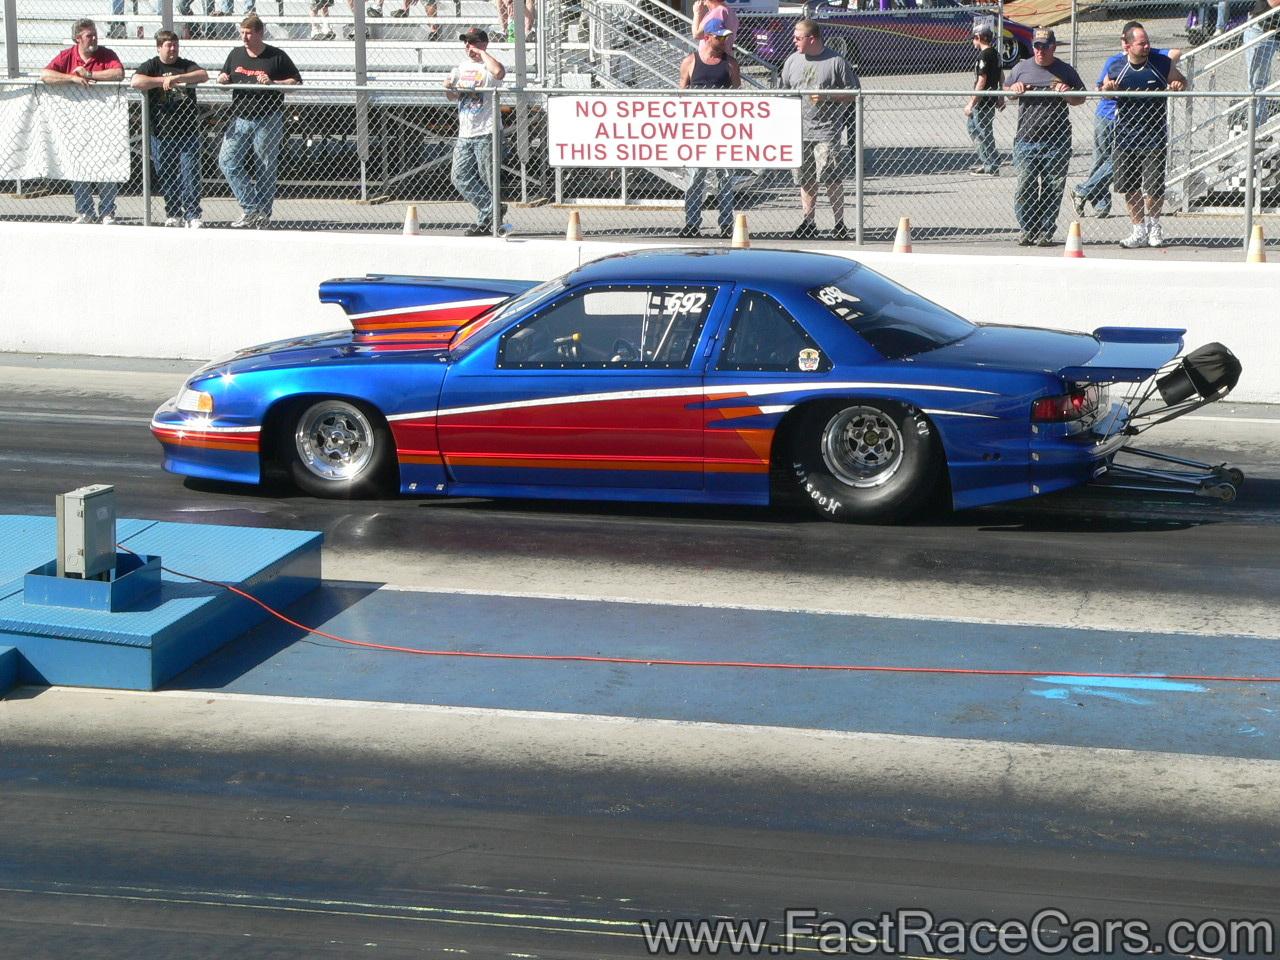 Chevrolet Lumina Drag Race Car